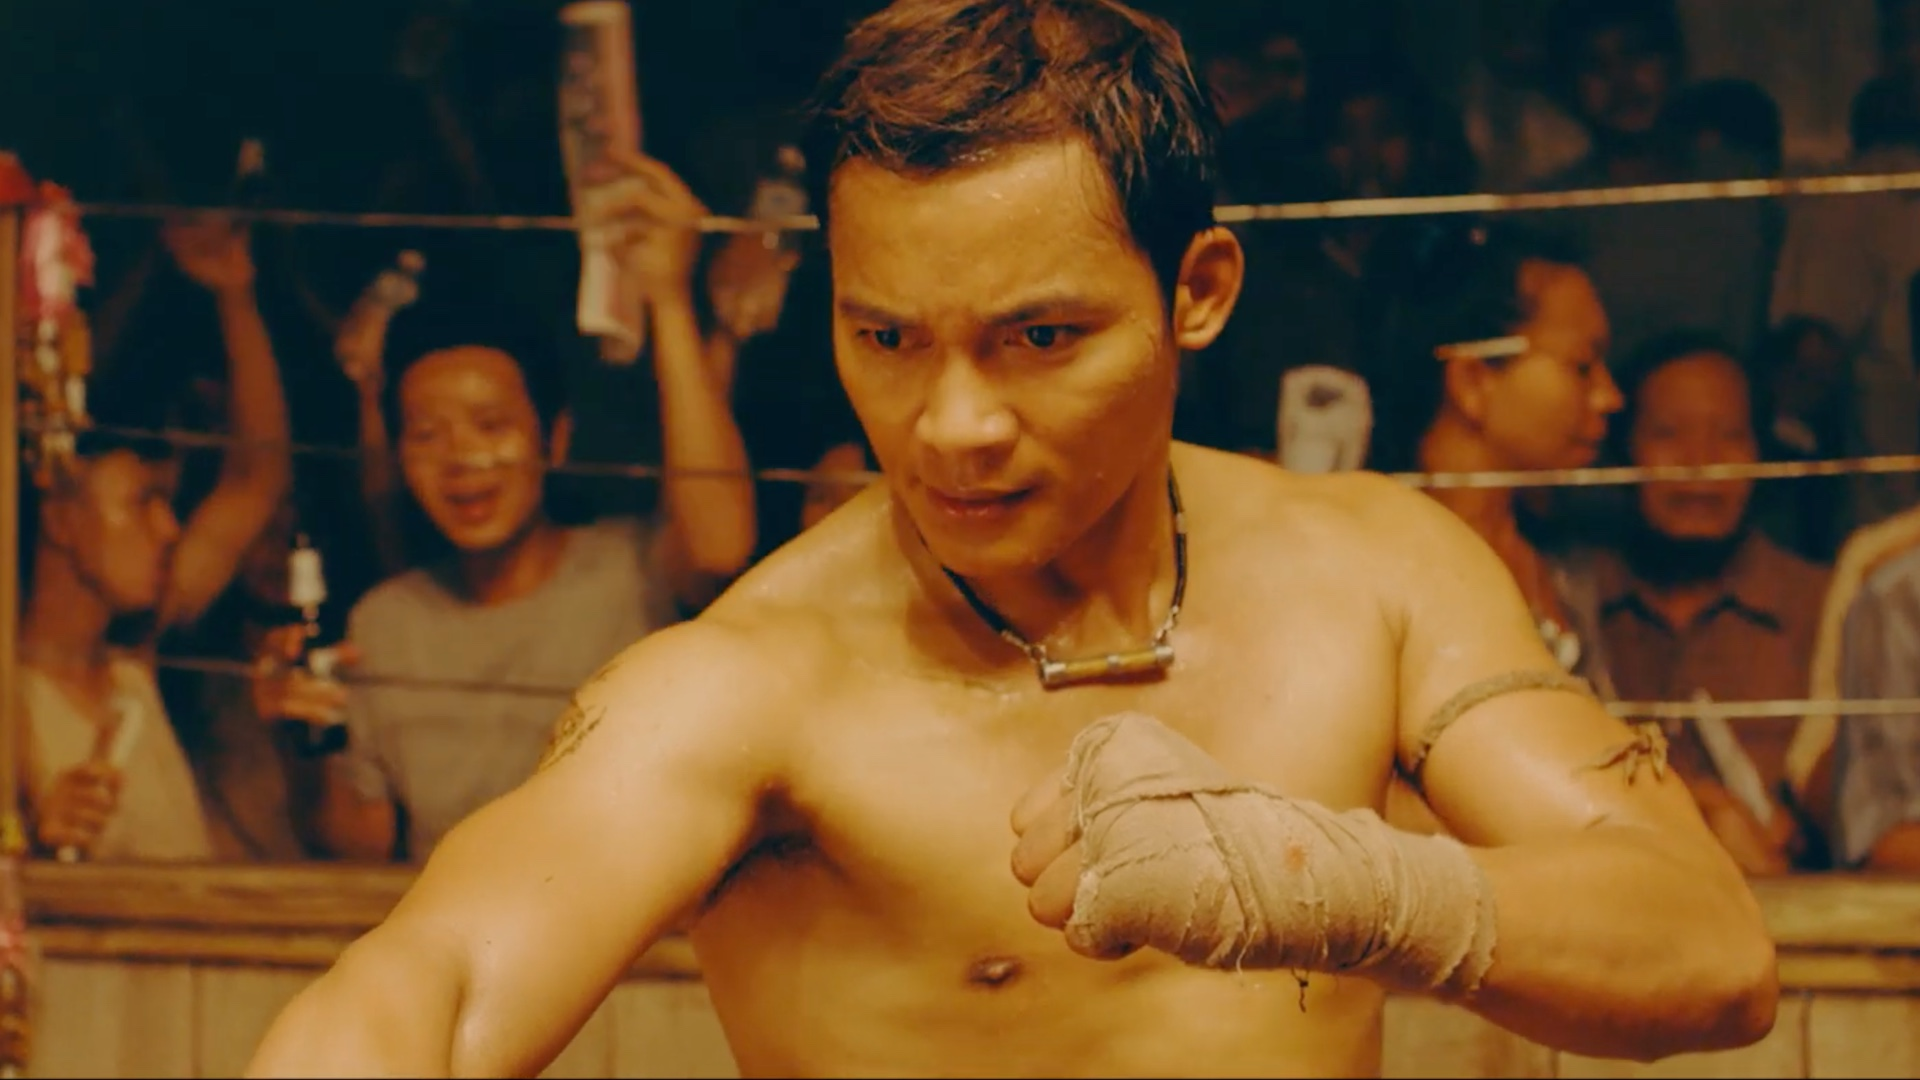 watch-tony-jaa-kick-ass-in-new-clip-from-the-martial-arts-film-triple-threat-social.jpg